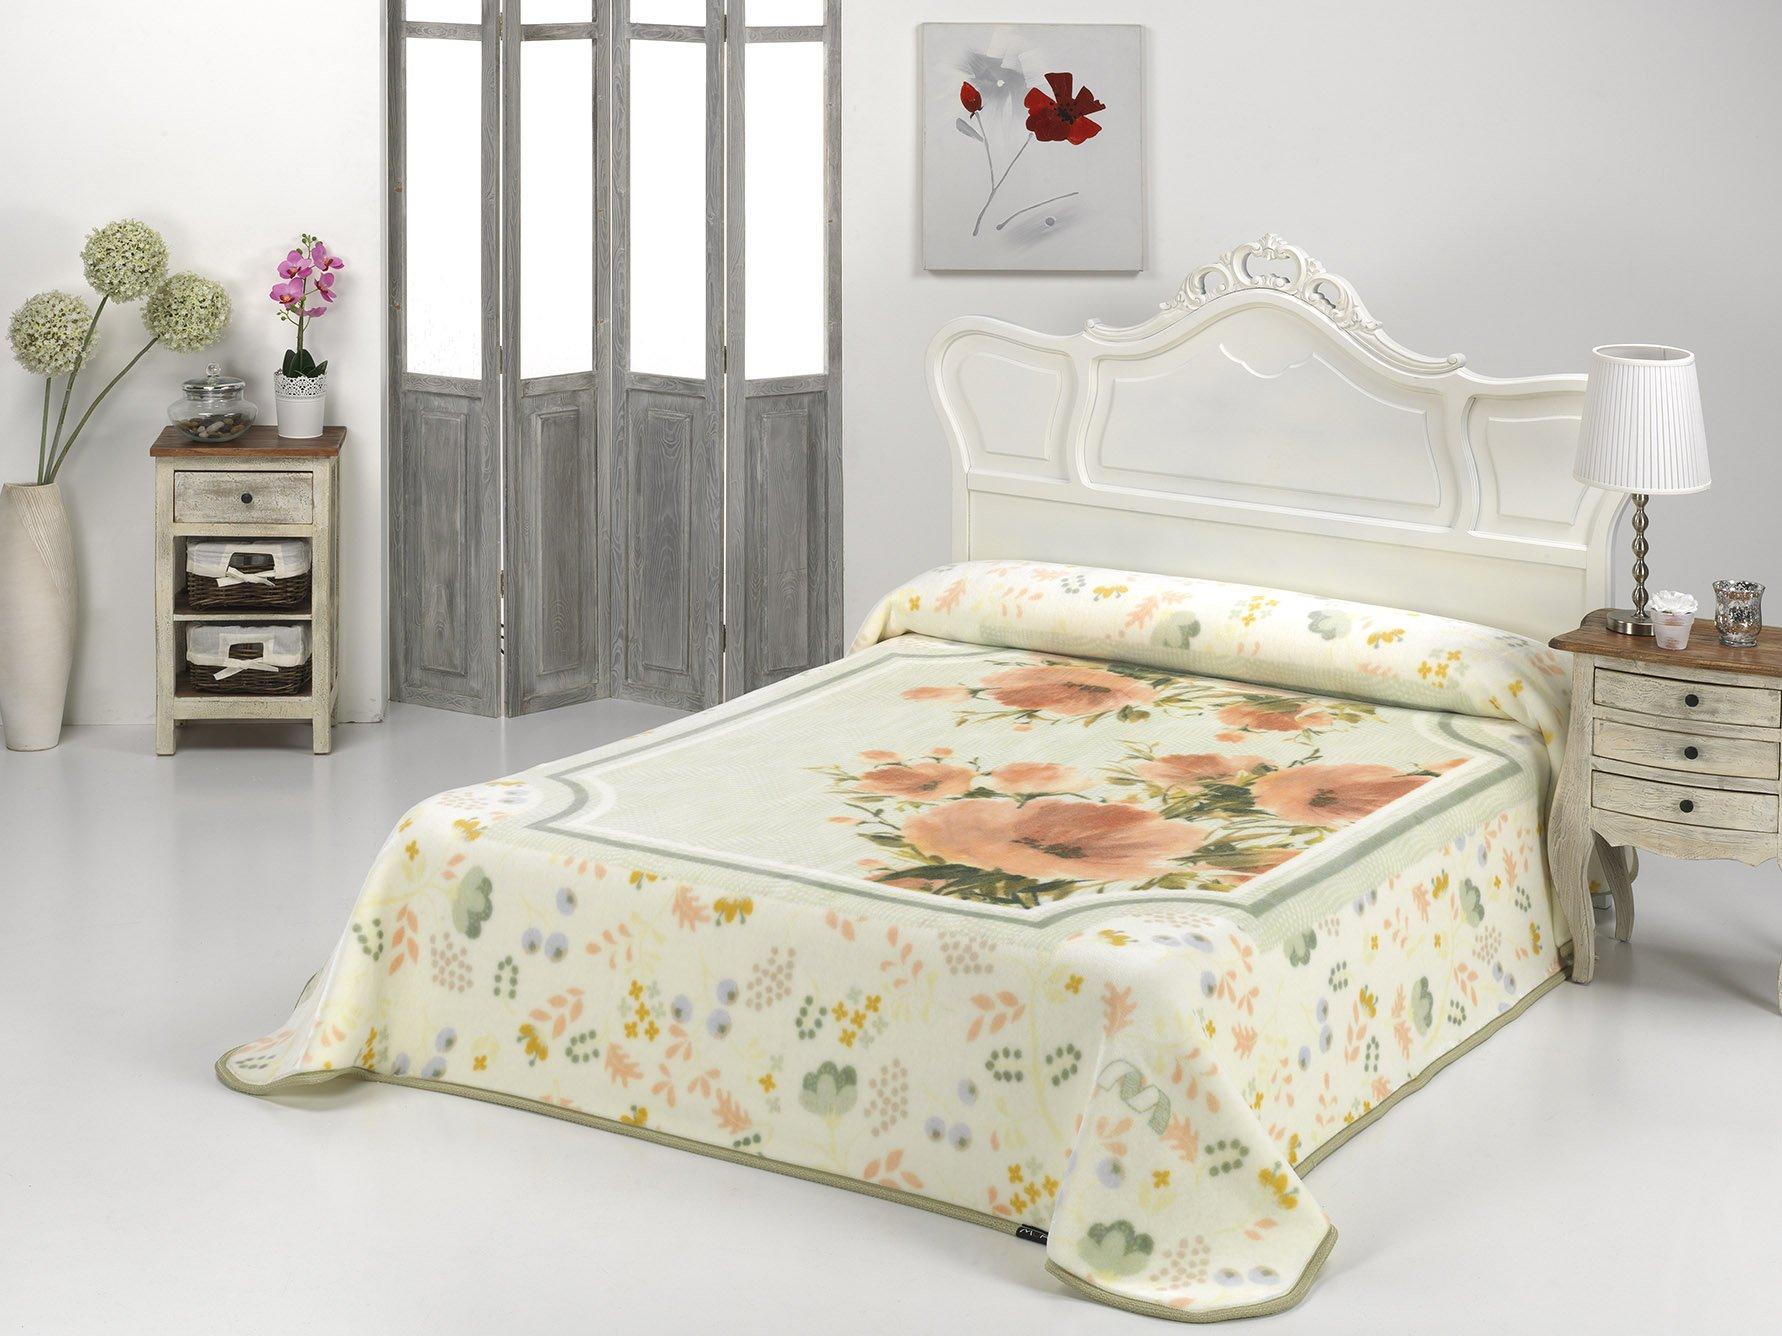 European - Made in Spain warm blanket Mora Gold 220x240 1 PLY Verde Color